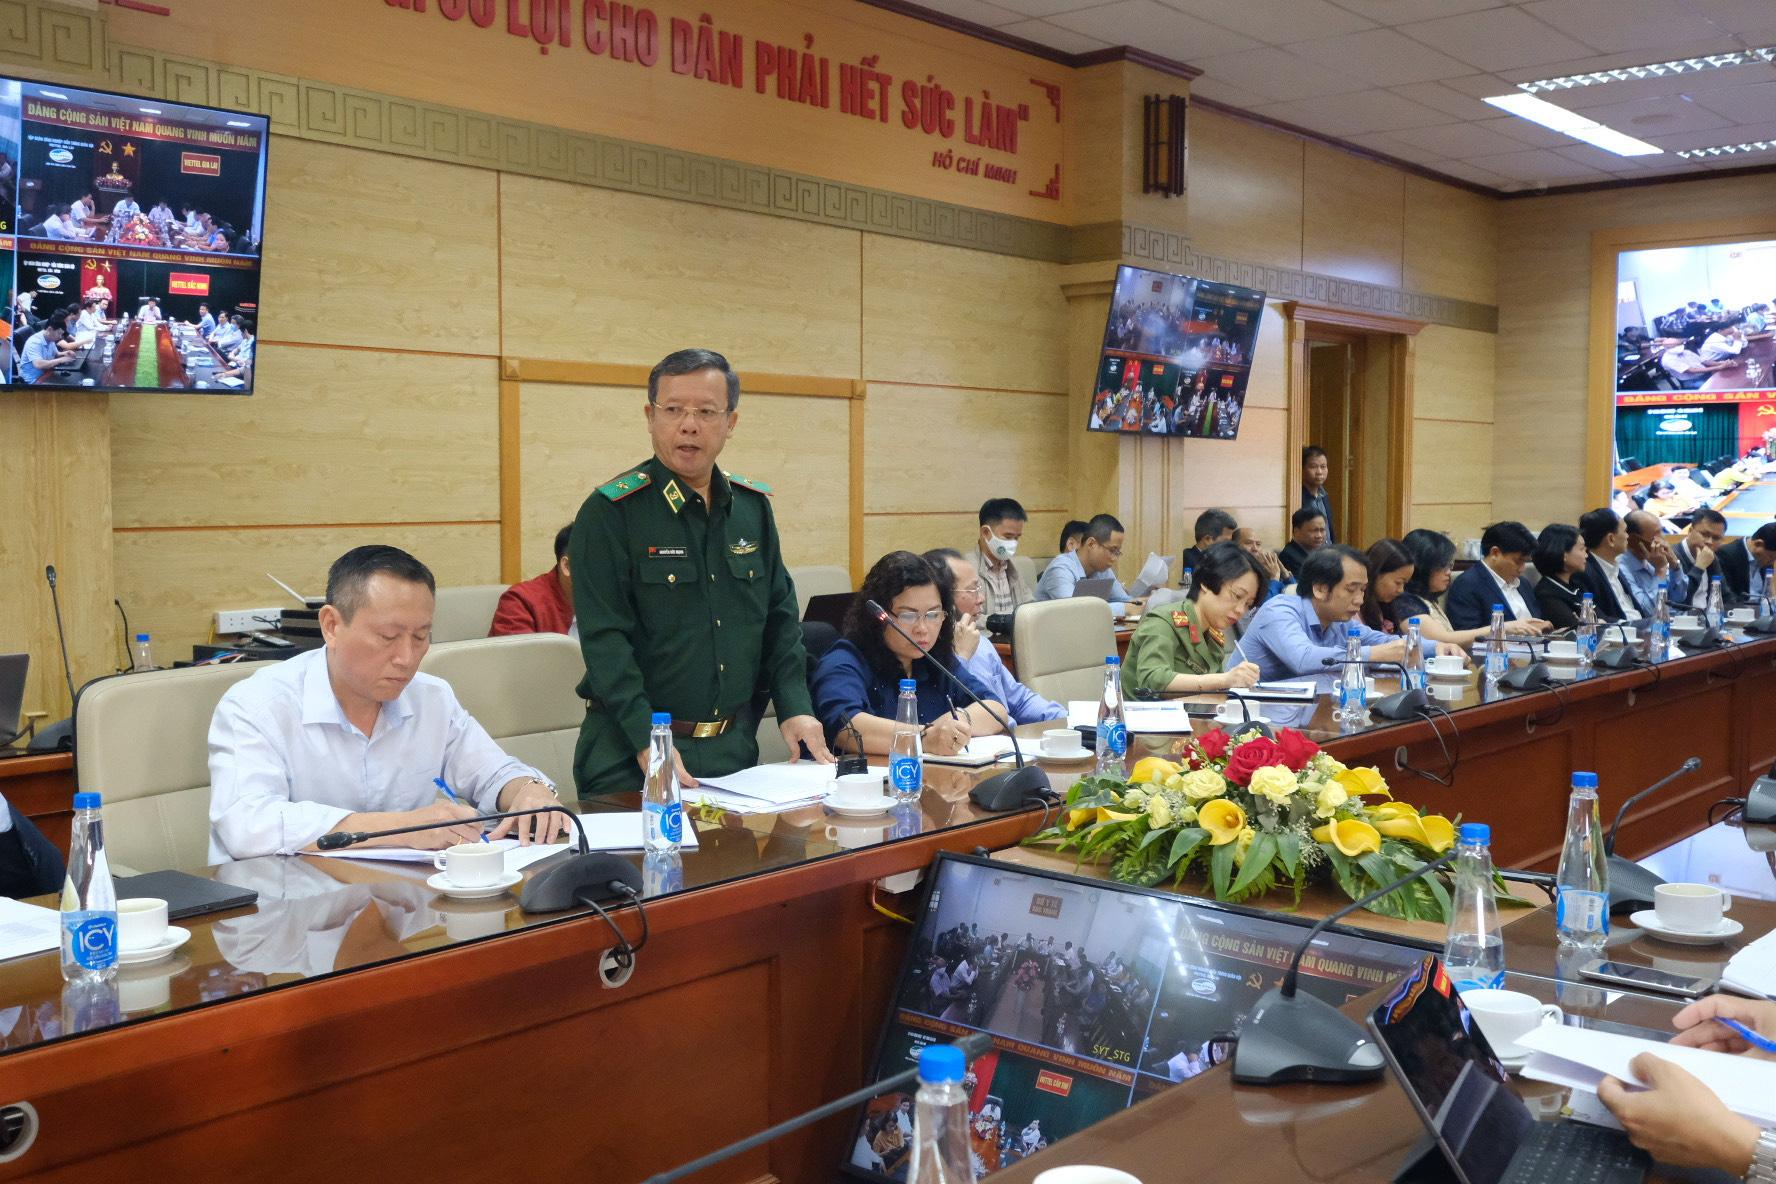 Over 20,000 border jumpers detected in Vietnam since beginning of 2020: deputy commander